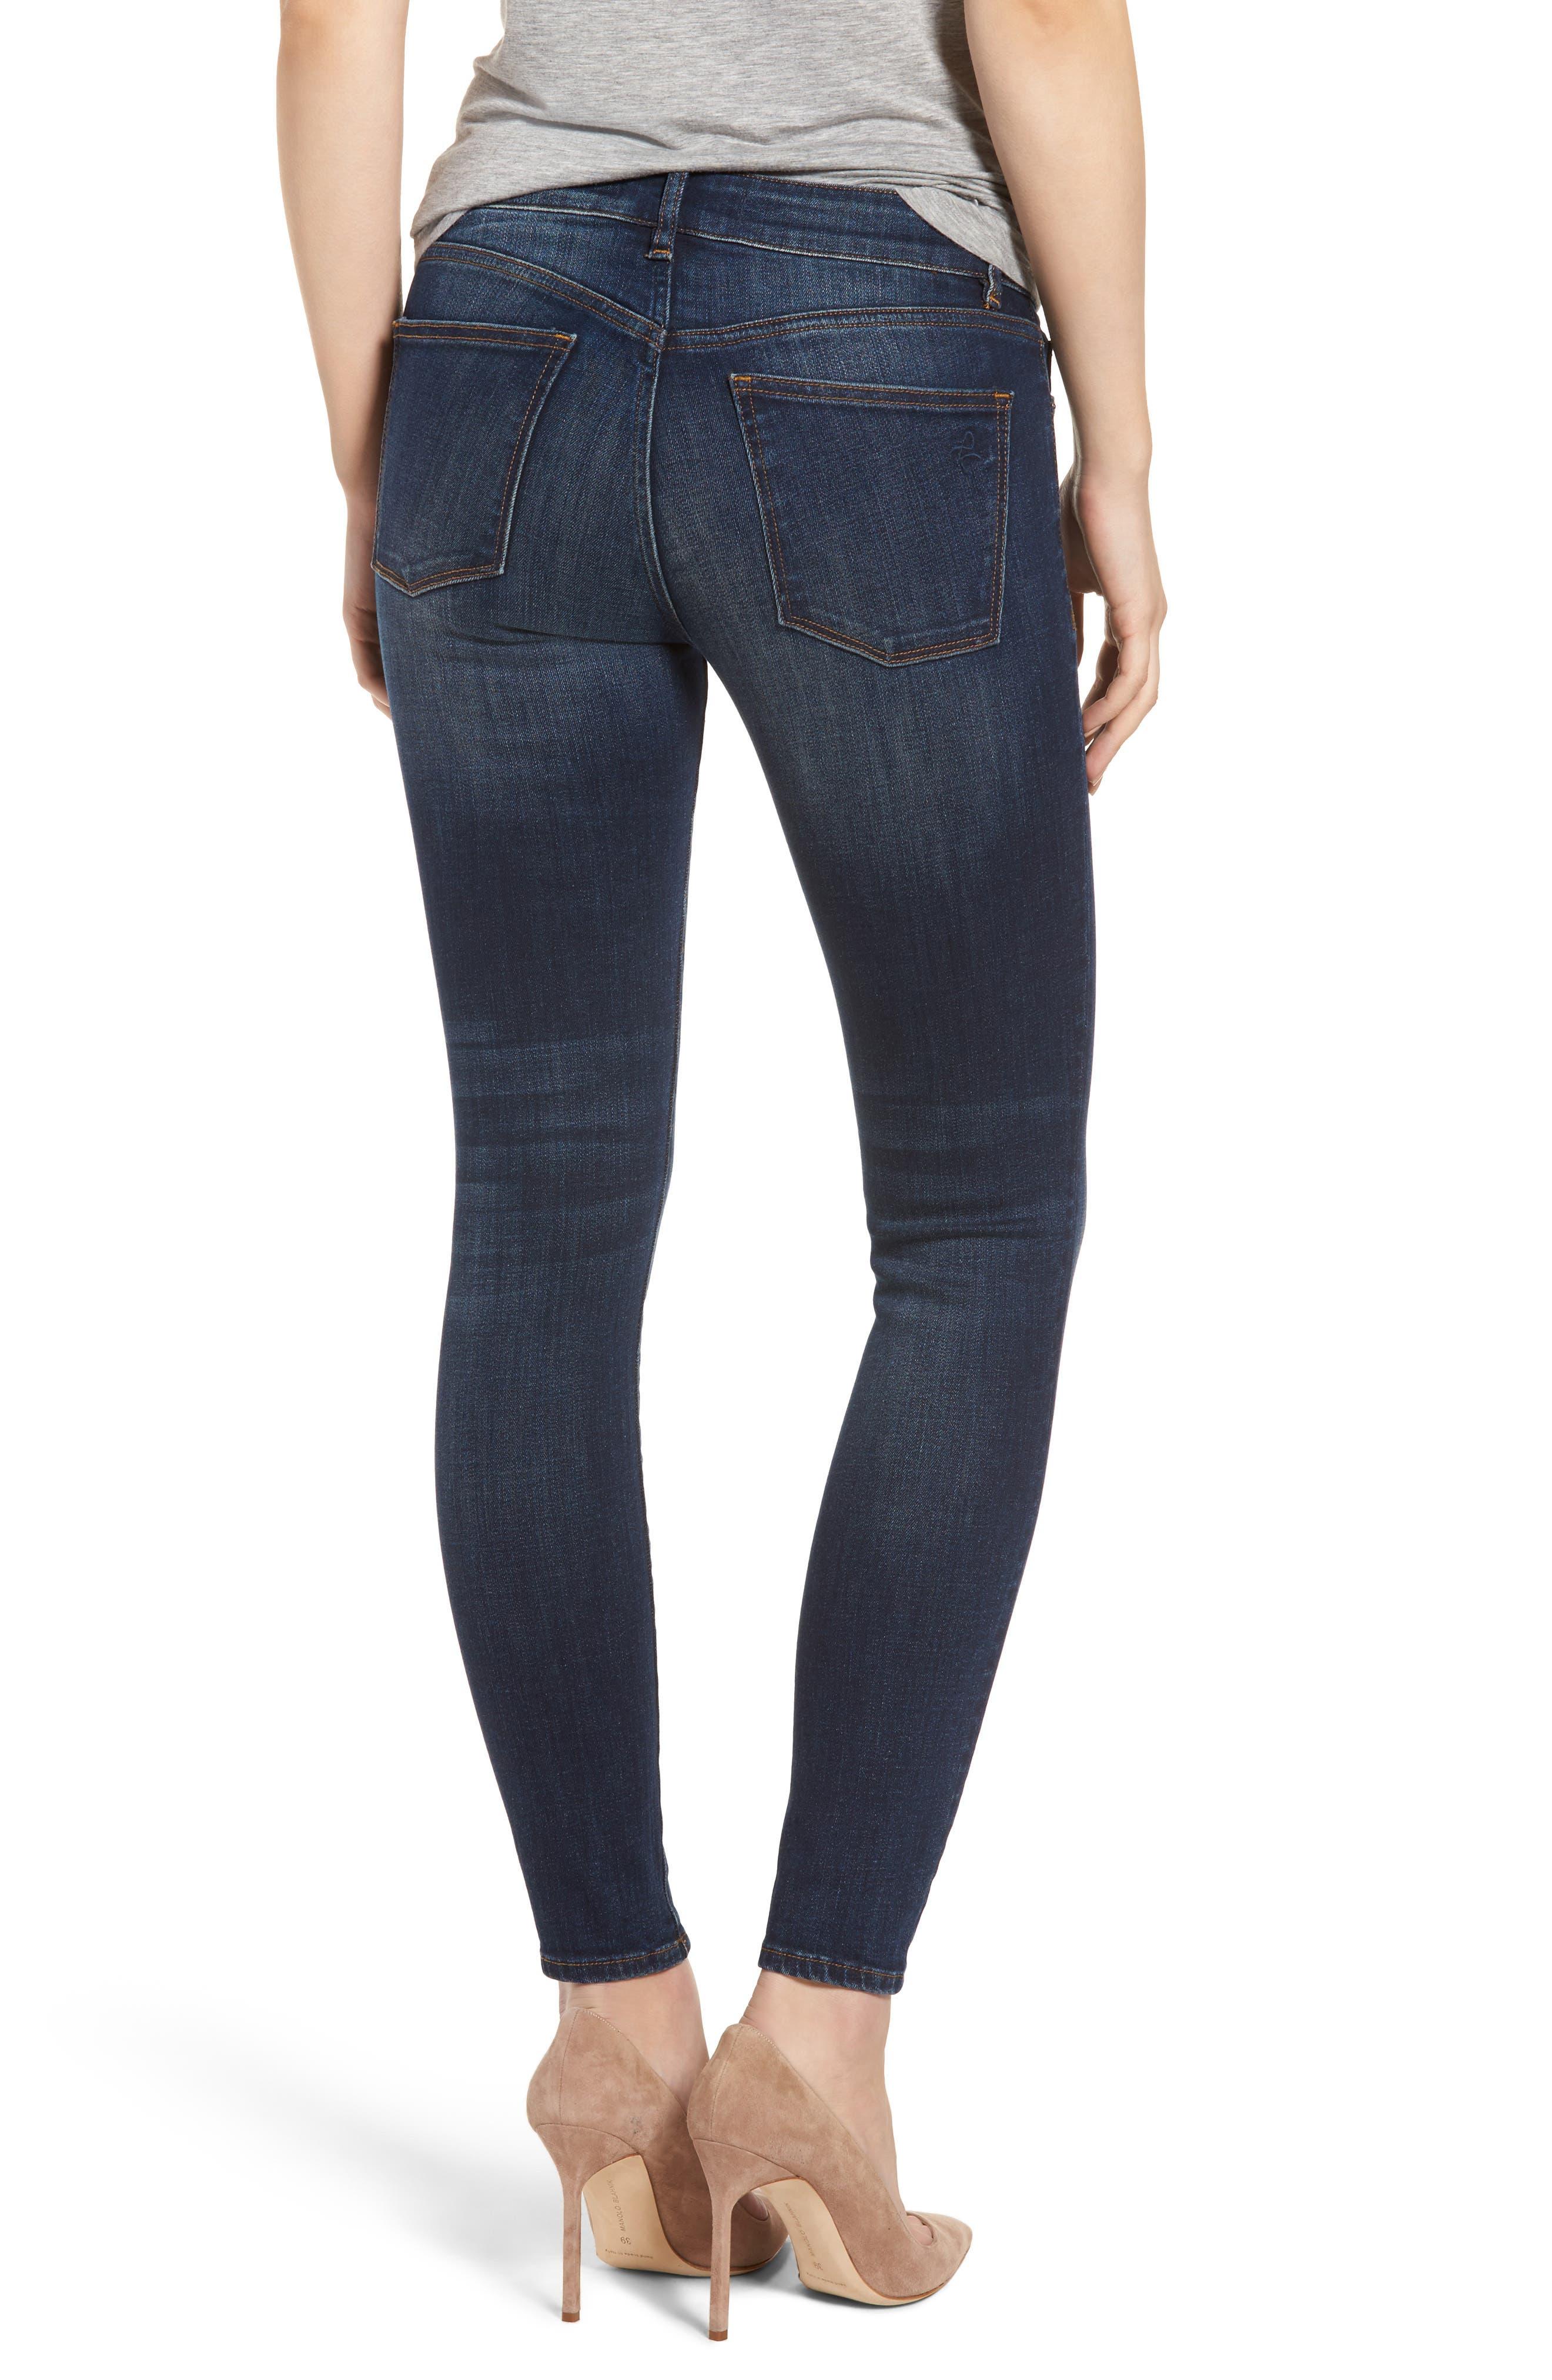 Emma Power Legging Skinny Jeans,                             Alternate thumbnail 2, color,                             Sulton